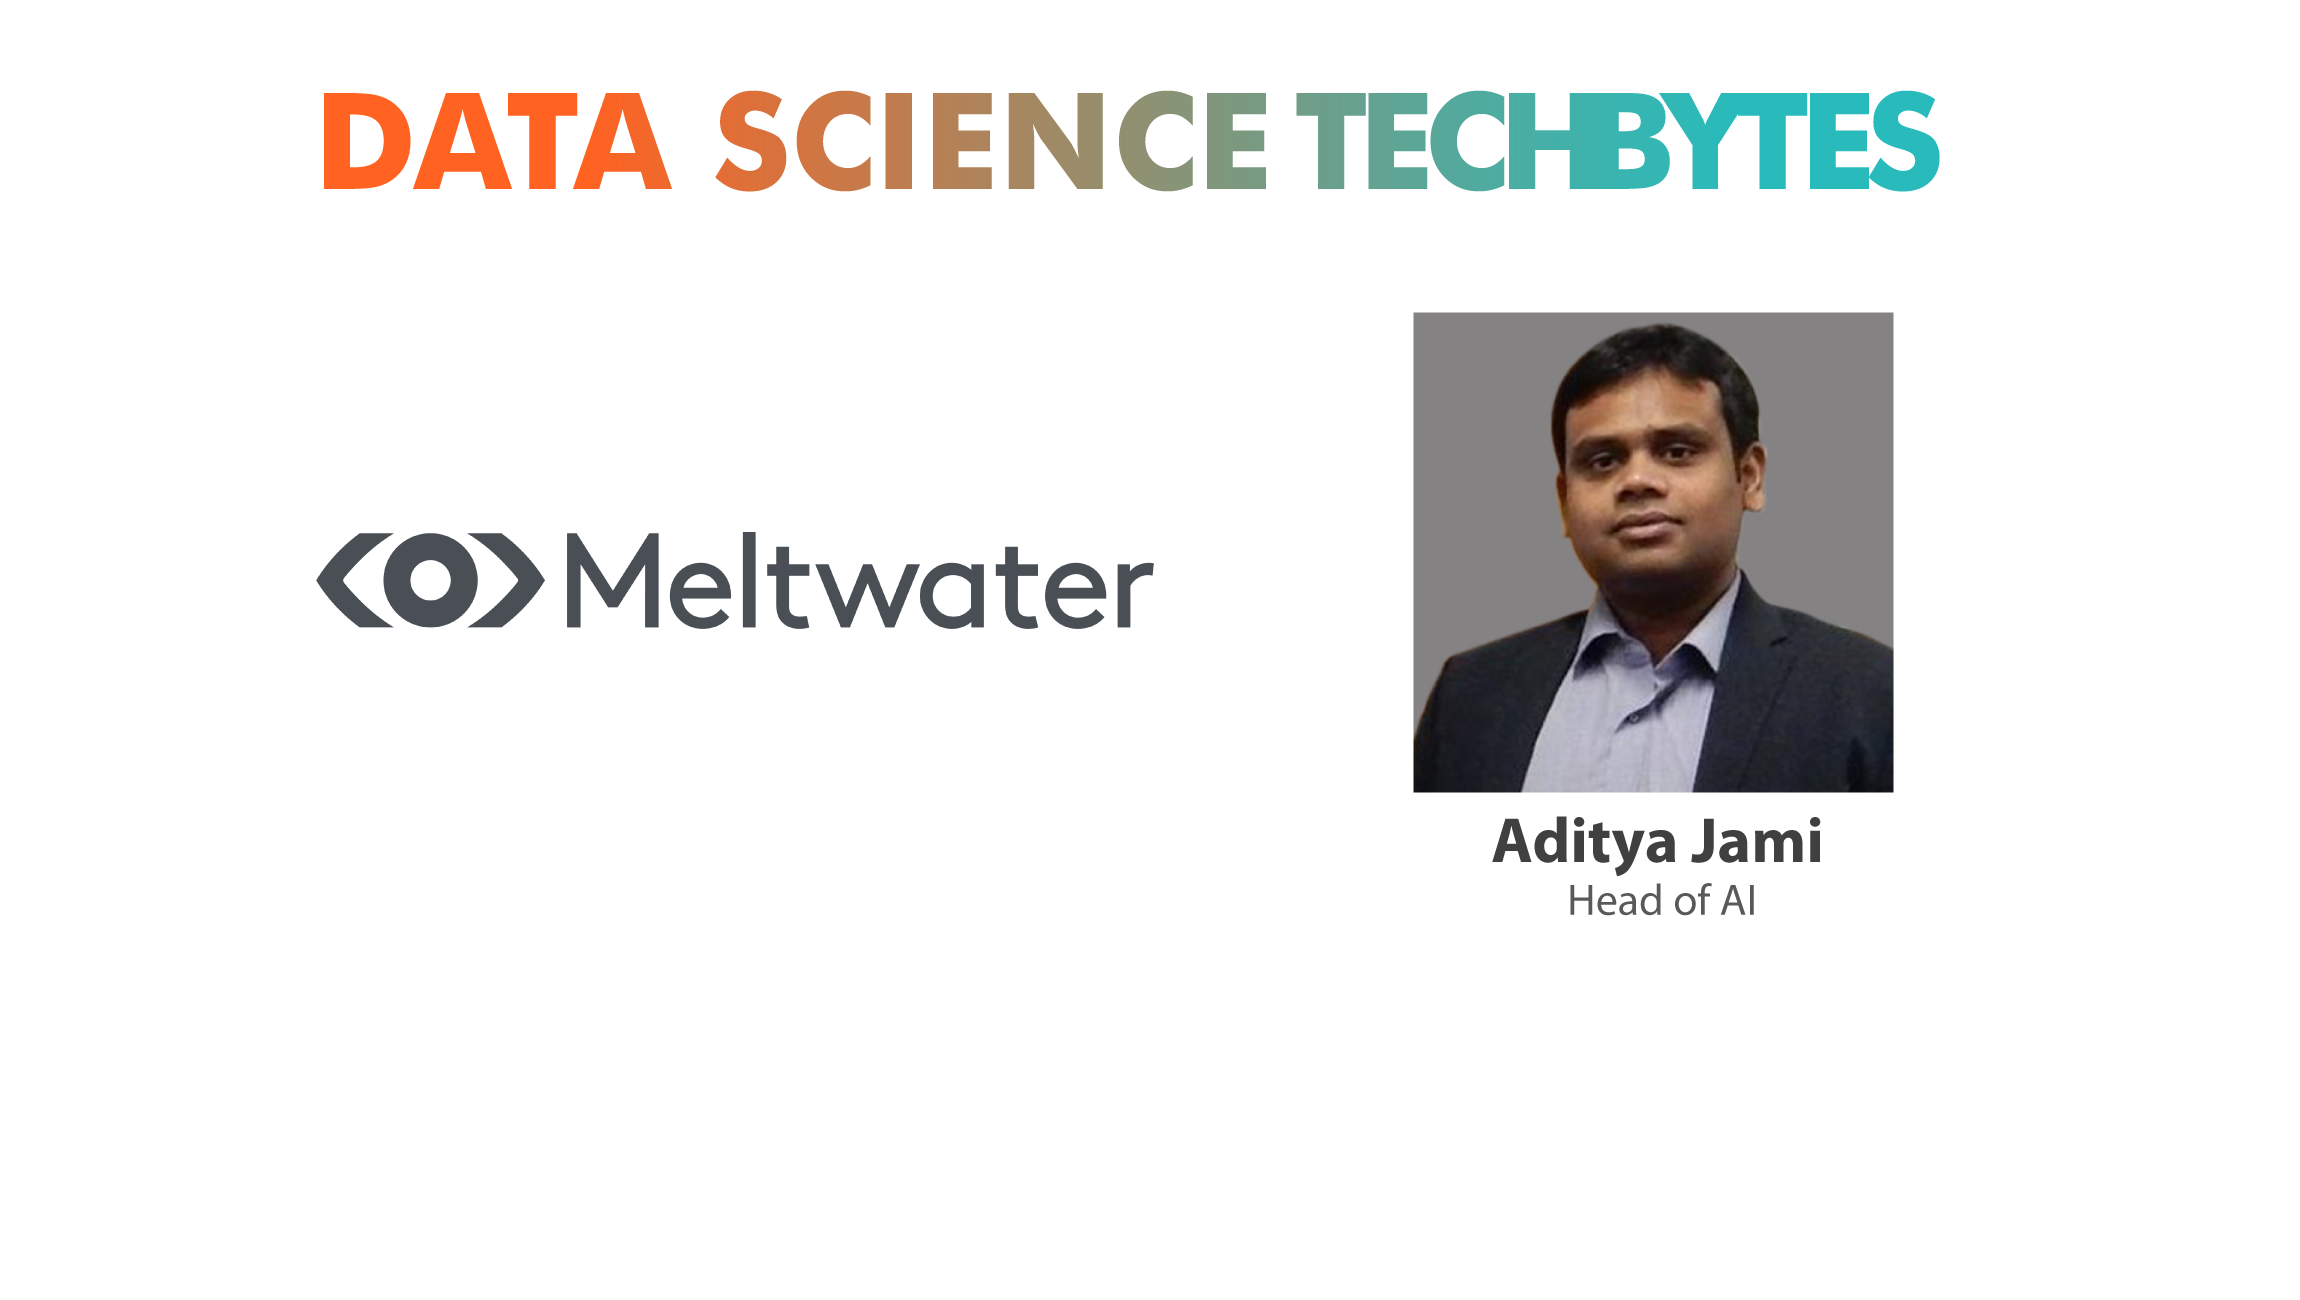 TechBytes with Aditya Jami, Senior Director, Data Science